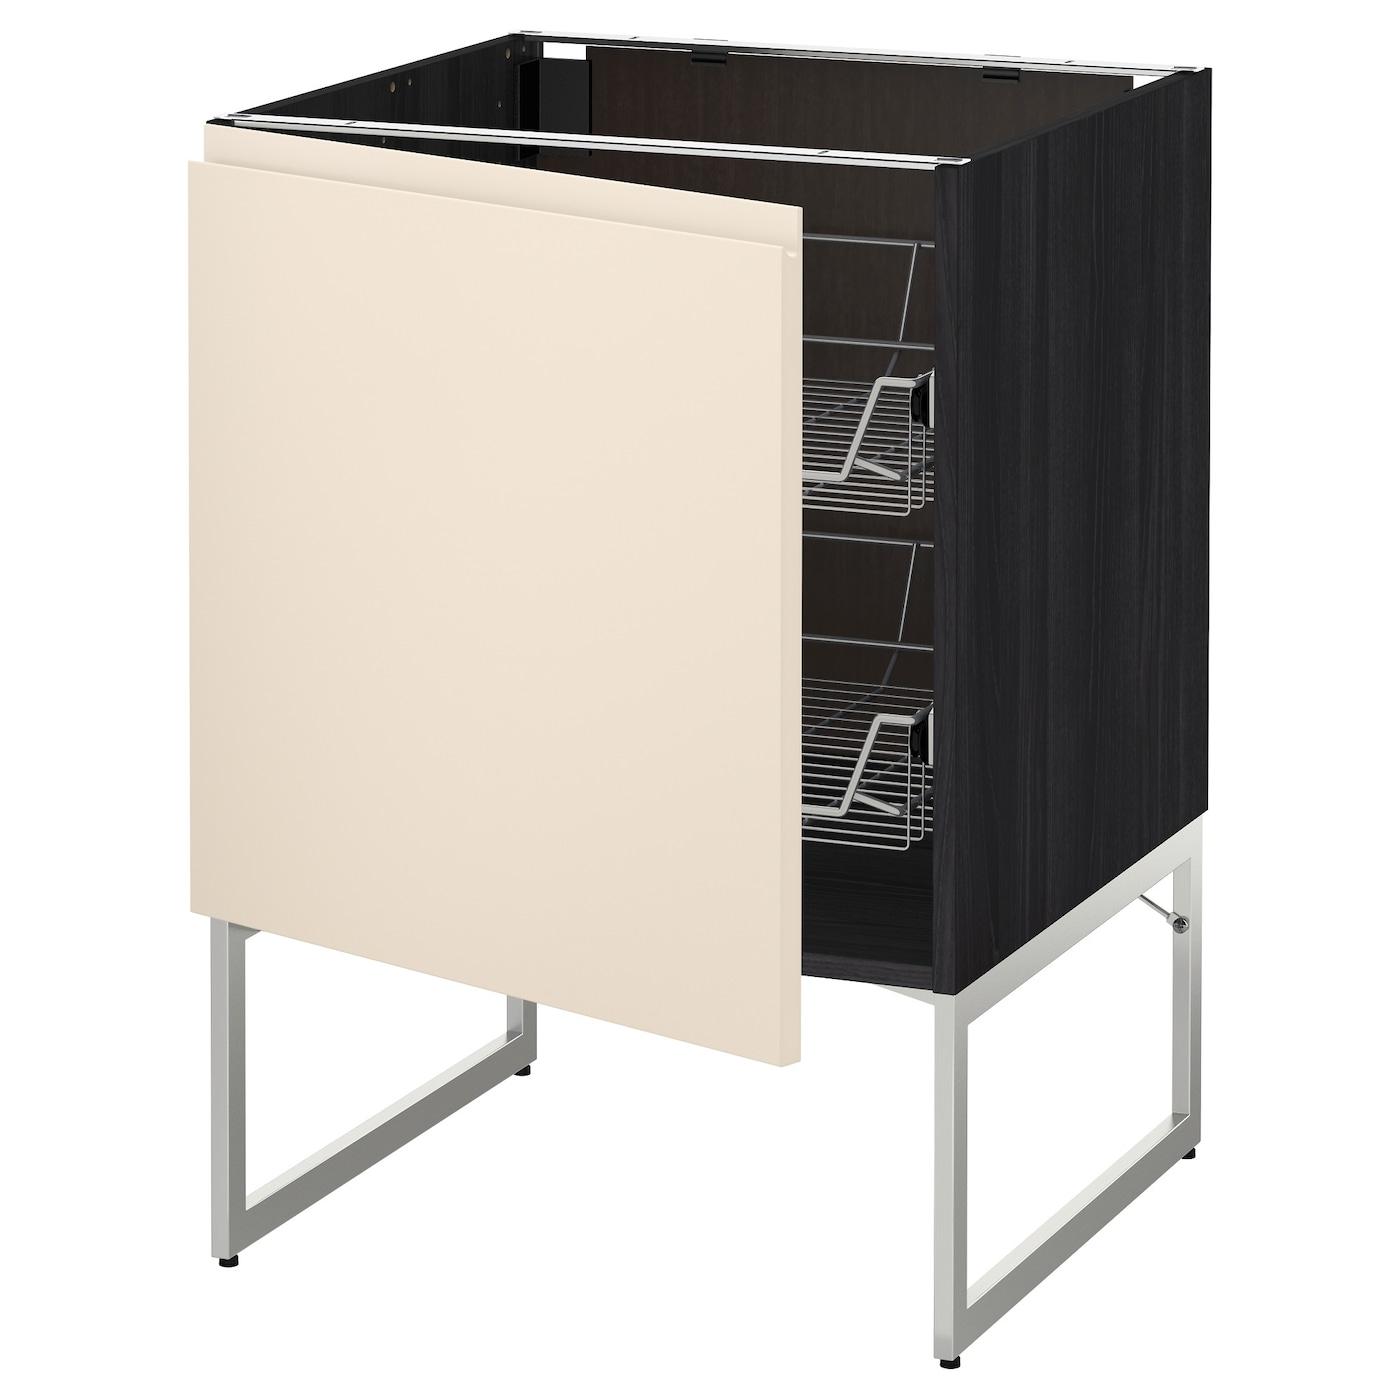 Metod base cabinet with wire baskets black voxtorp light for Black kitchen base cabinets